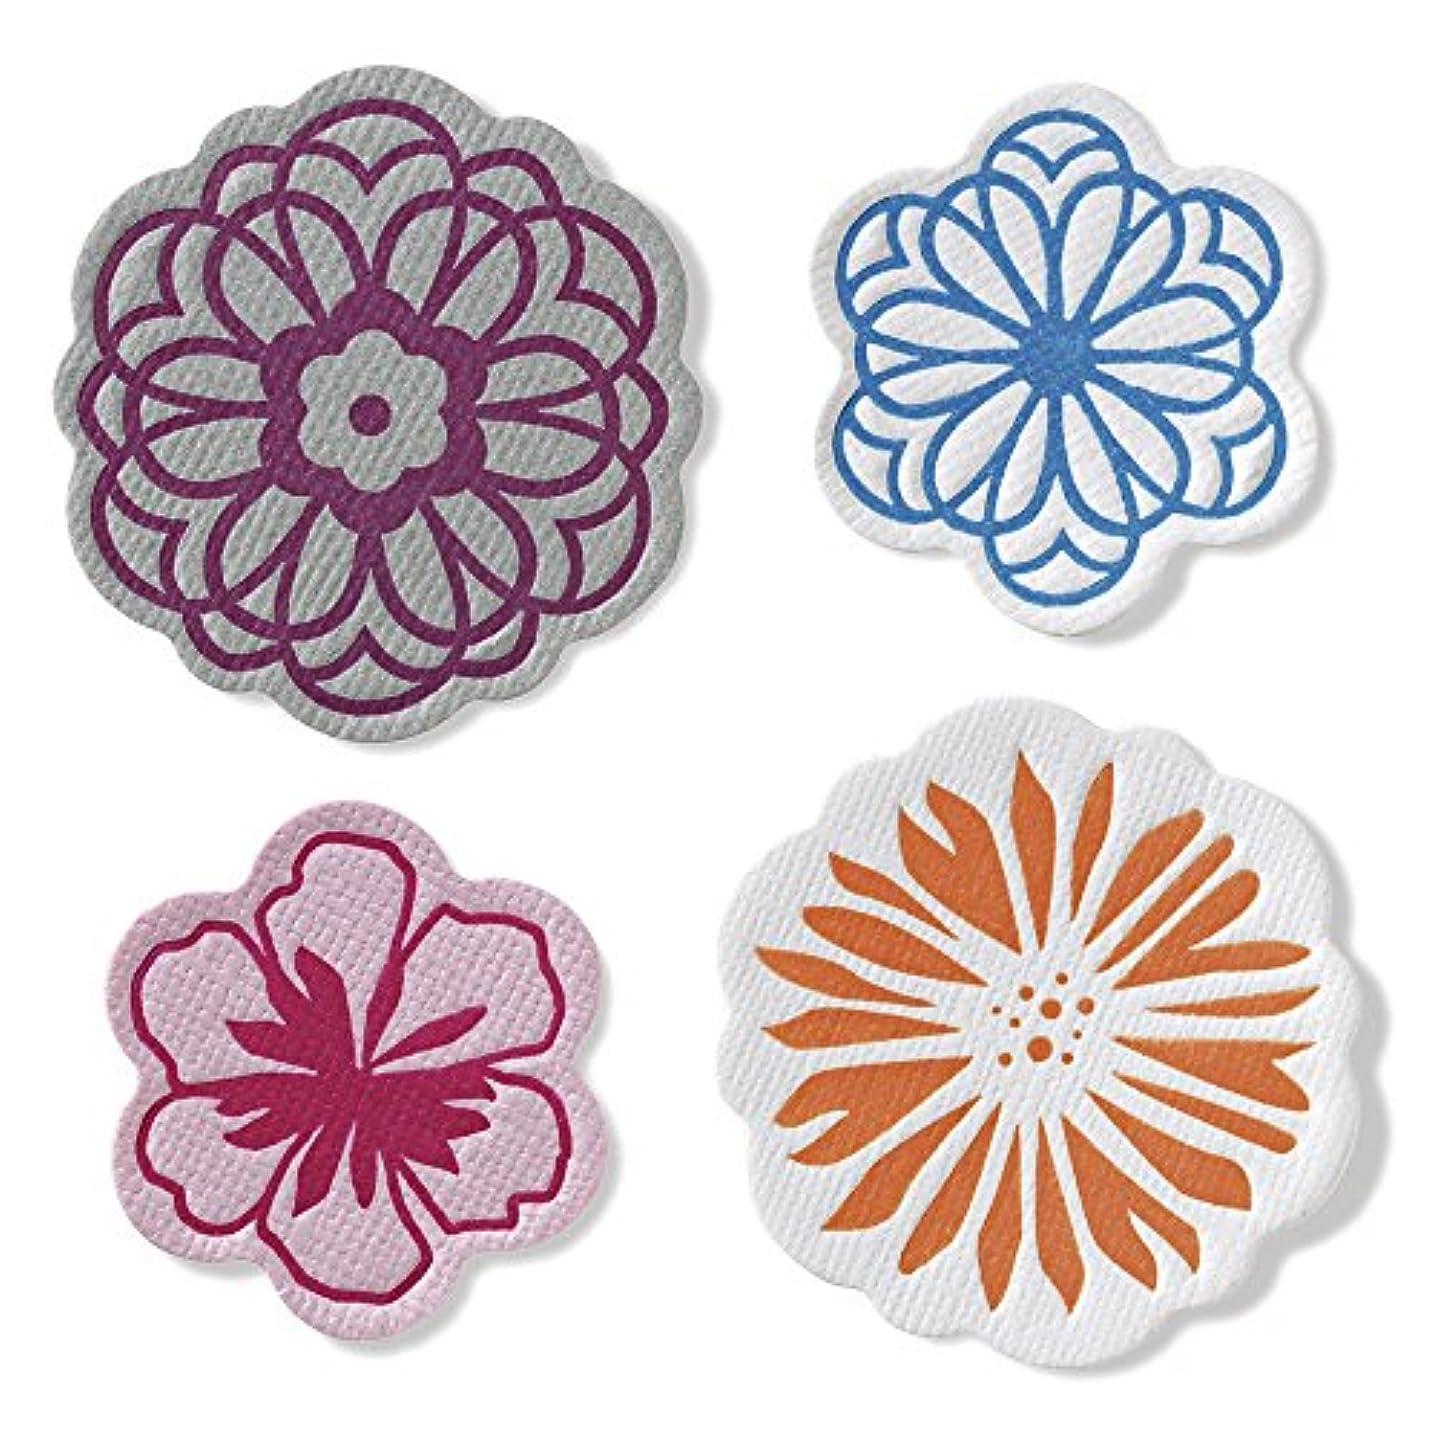 Fiskars Fuse Mini Petunia Design Plate Expansion, Grey by Fiskars